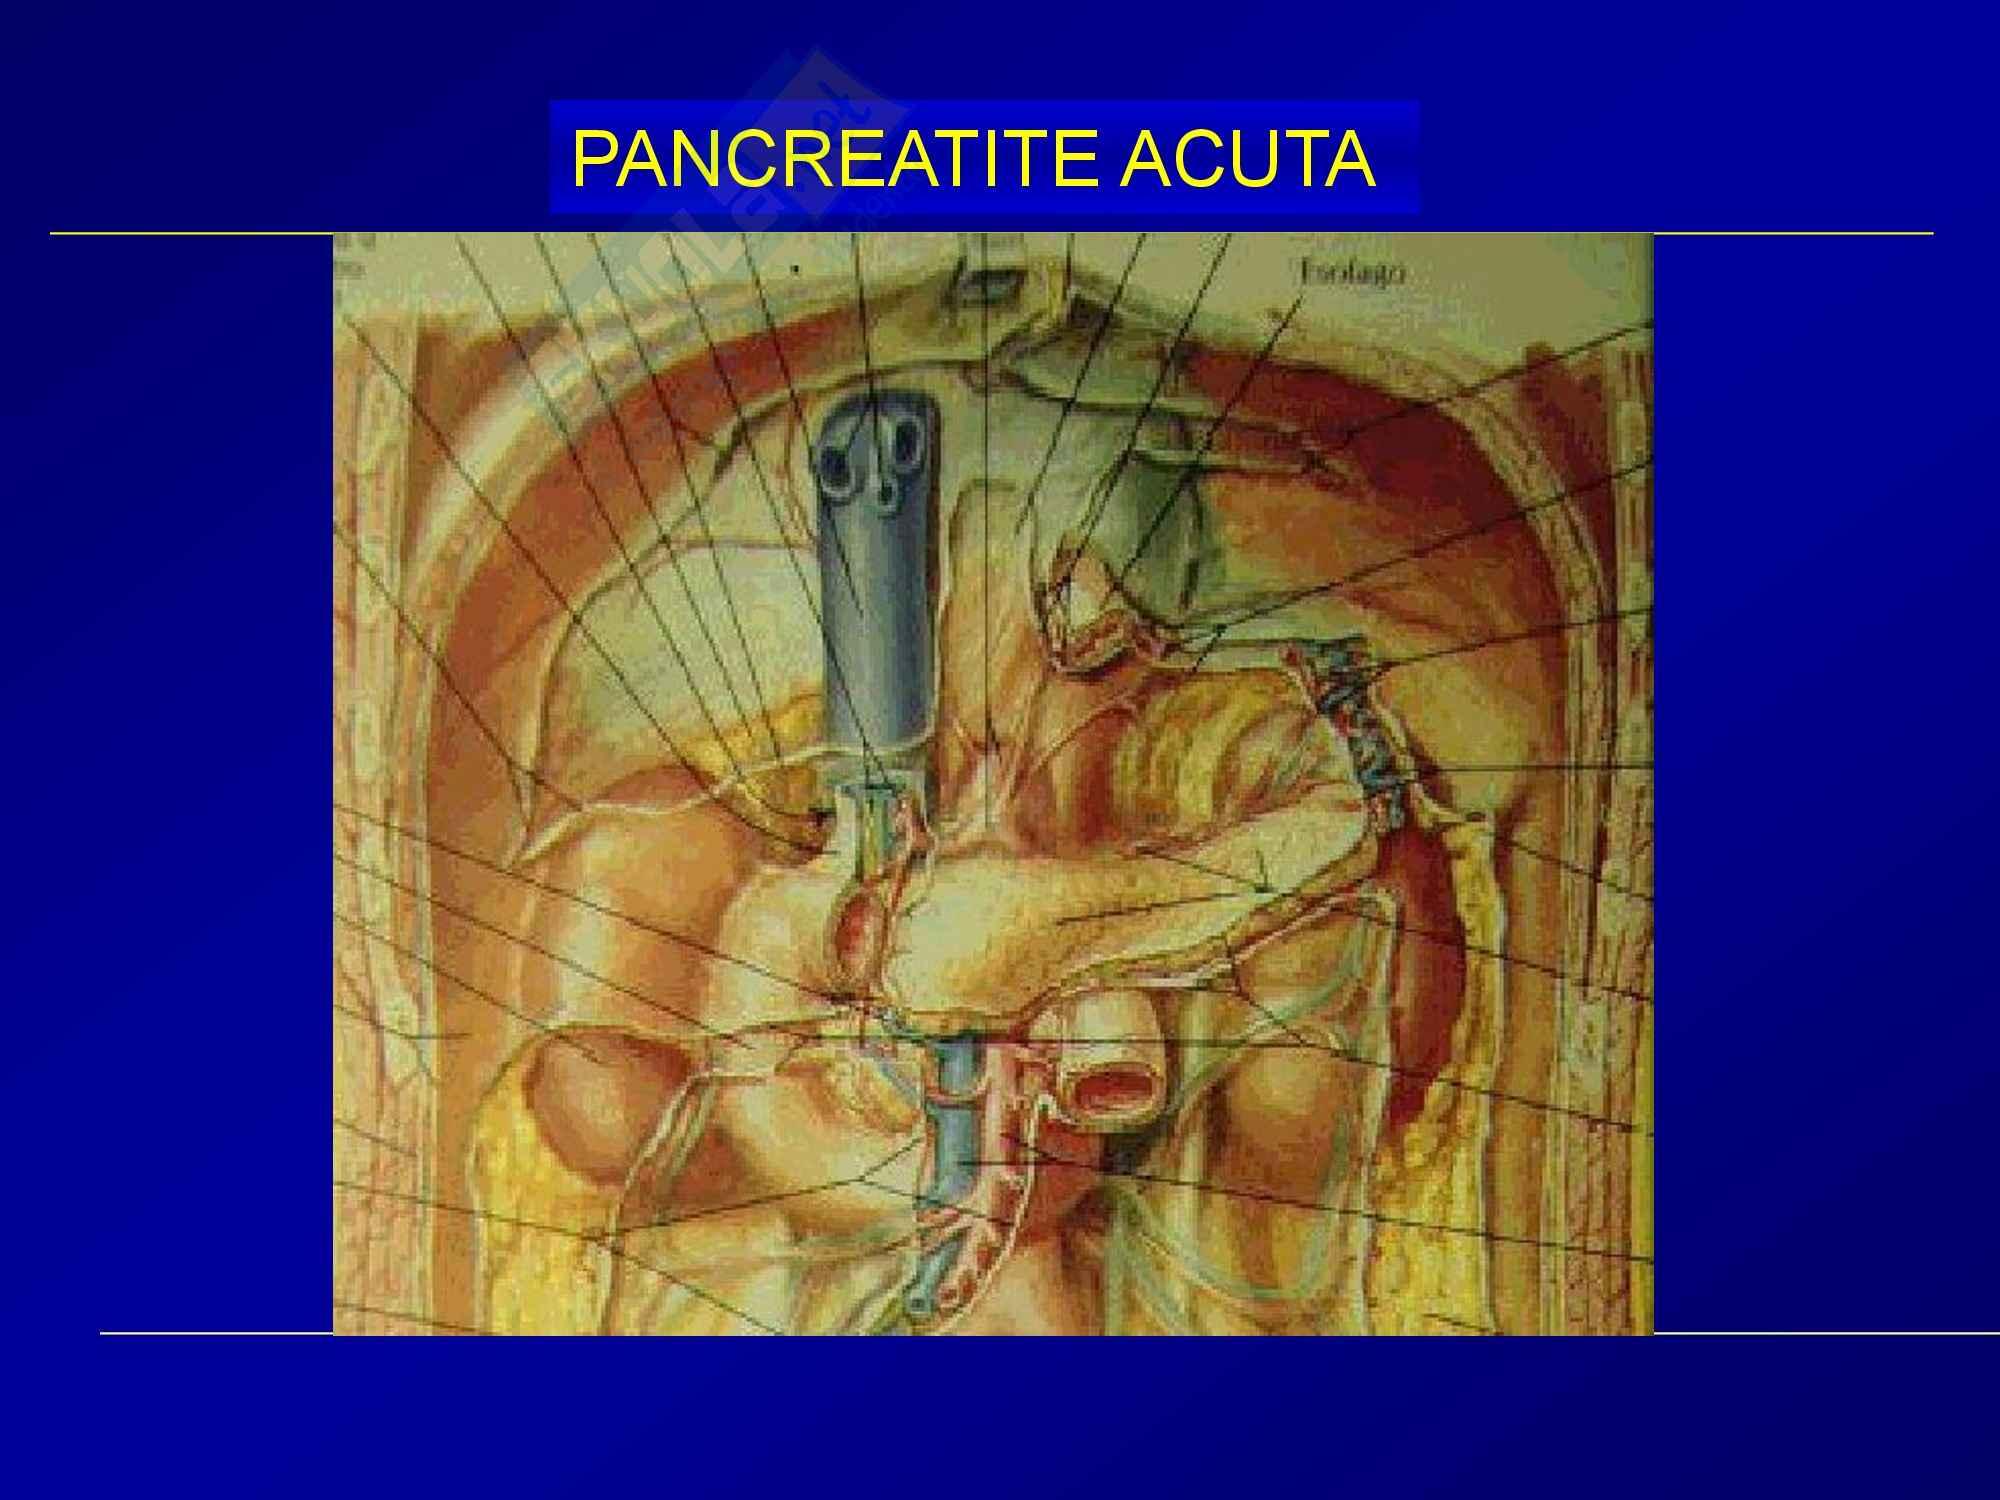 Chirurgia generale - pancreatite acuta Pag. 2